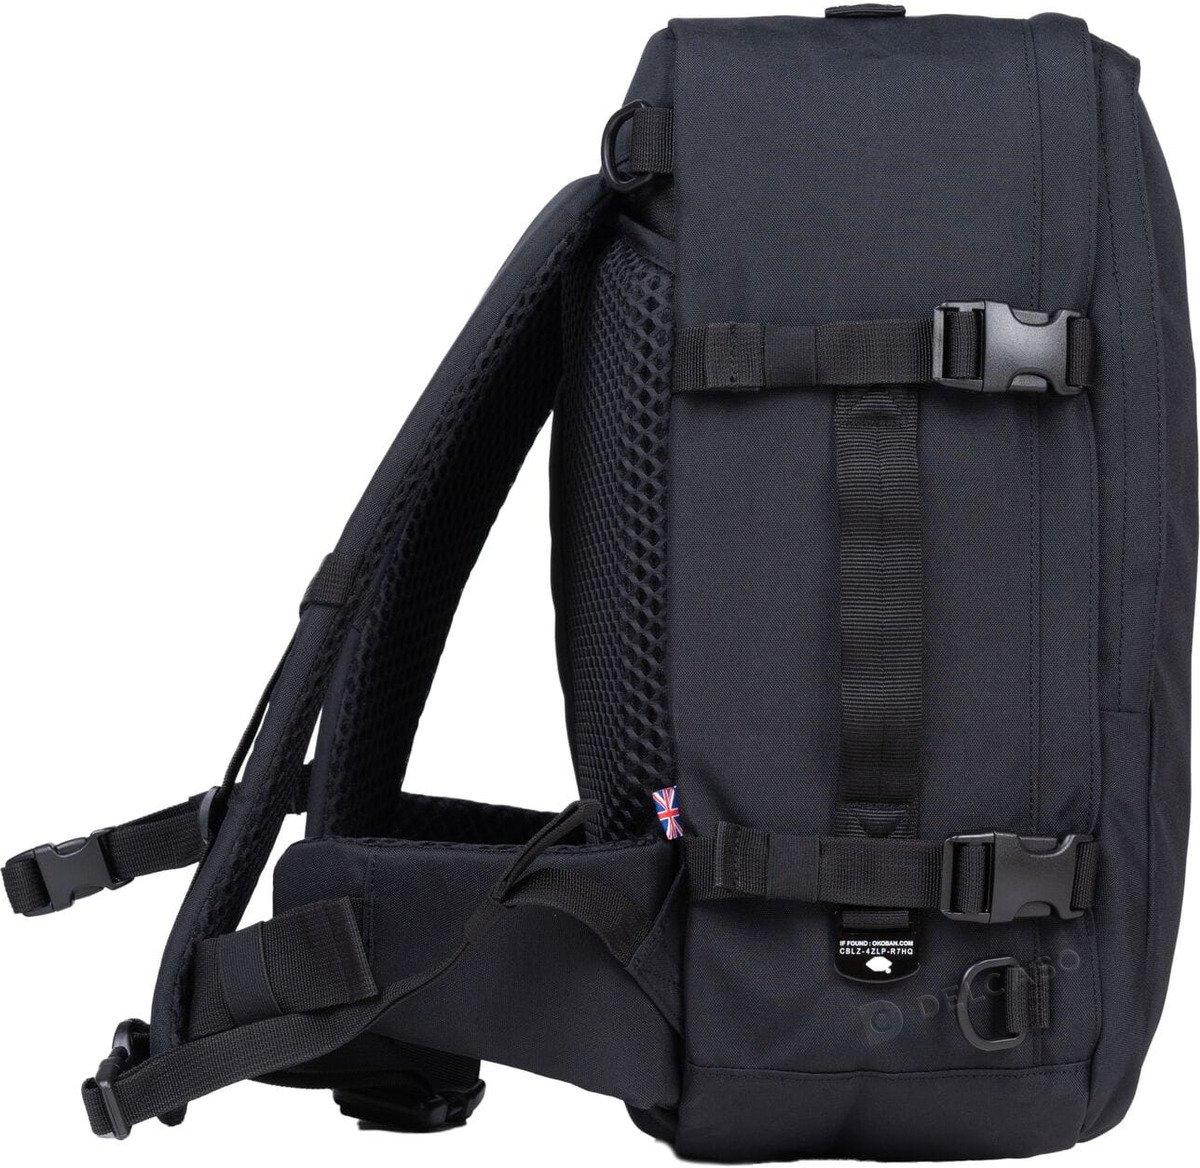 Plecak torba podręczna Cabin Zero Classic Pro 32L Absolute Black